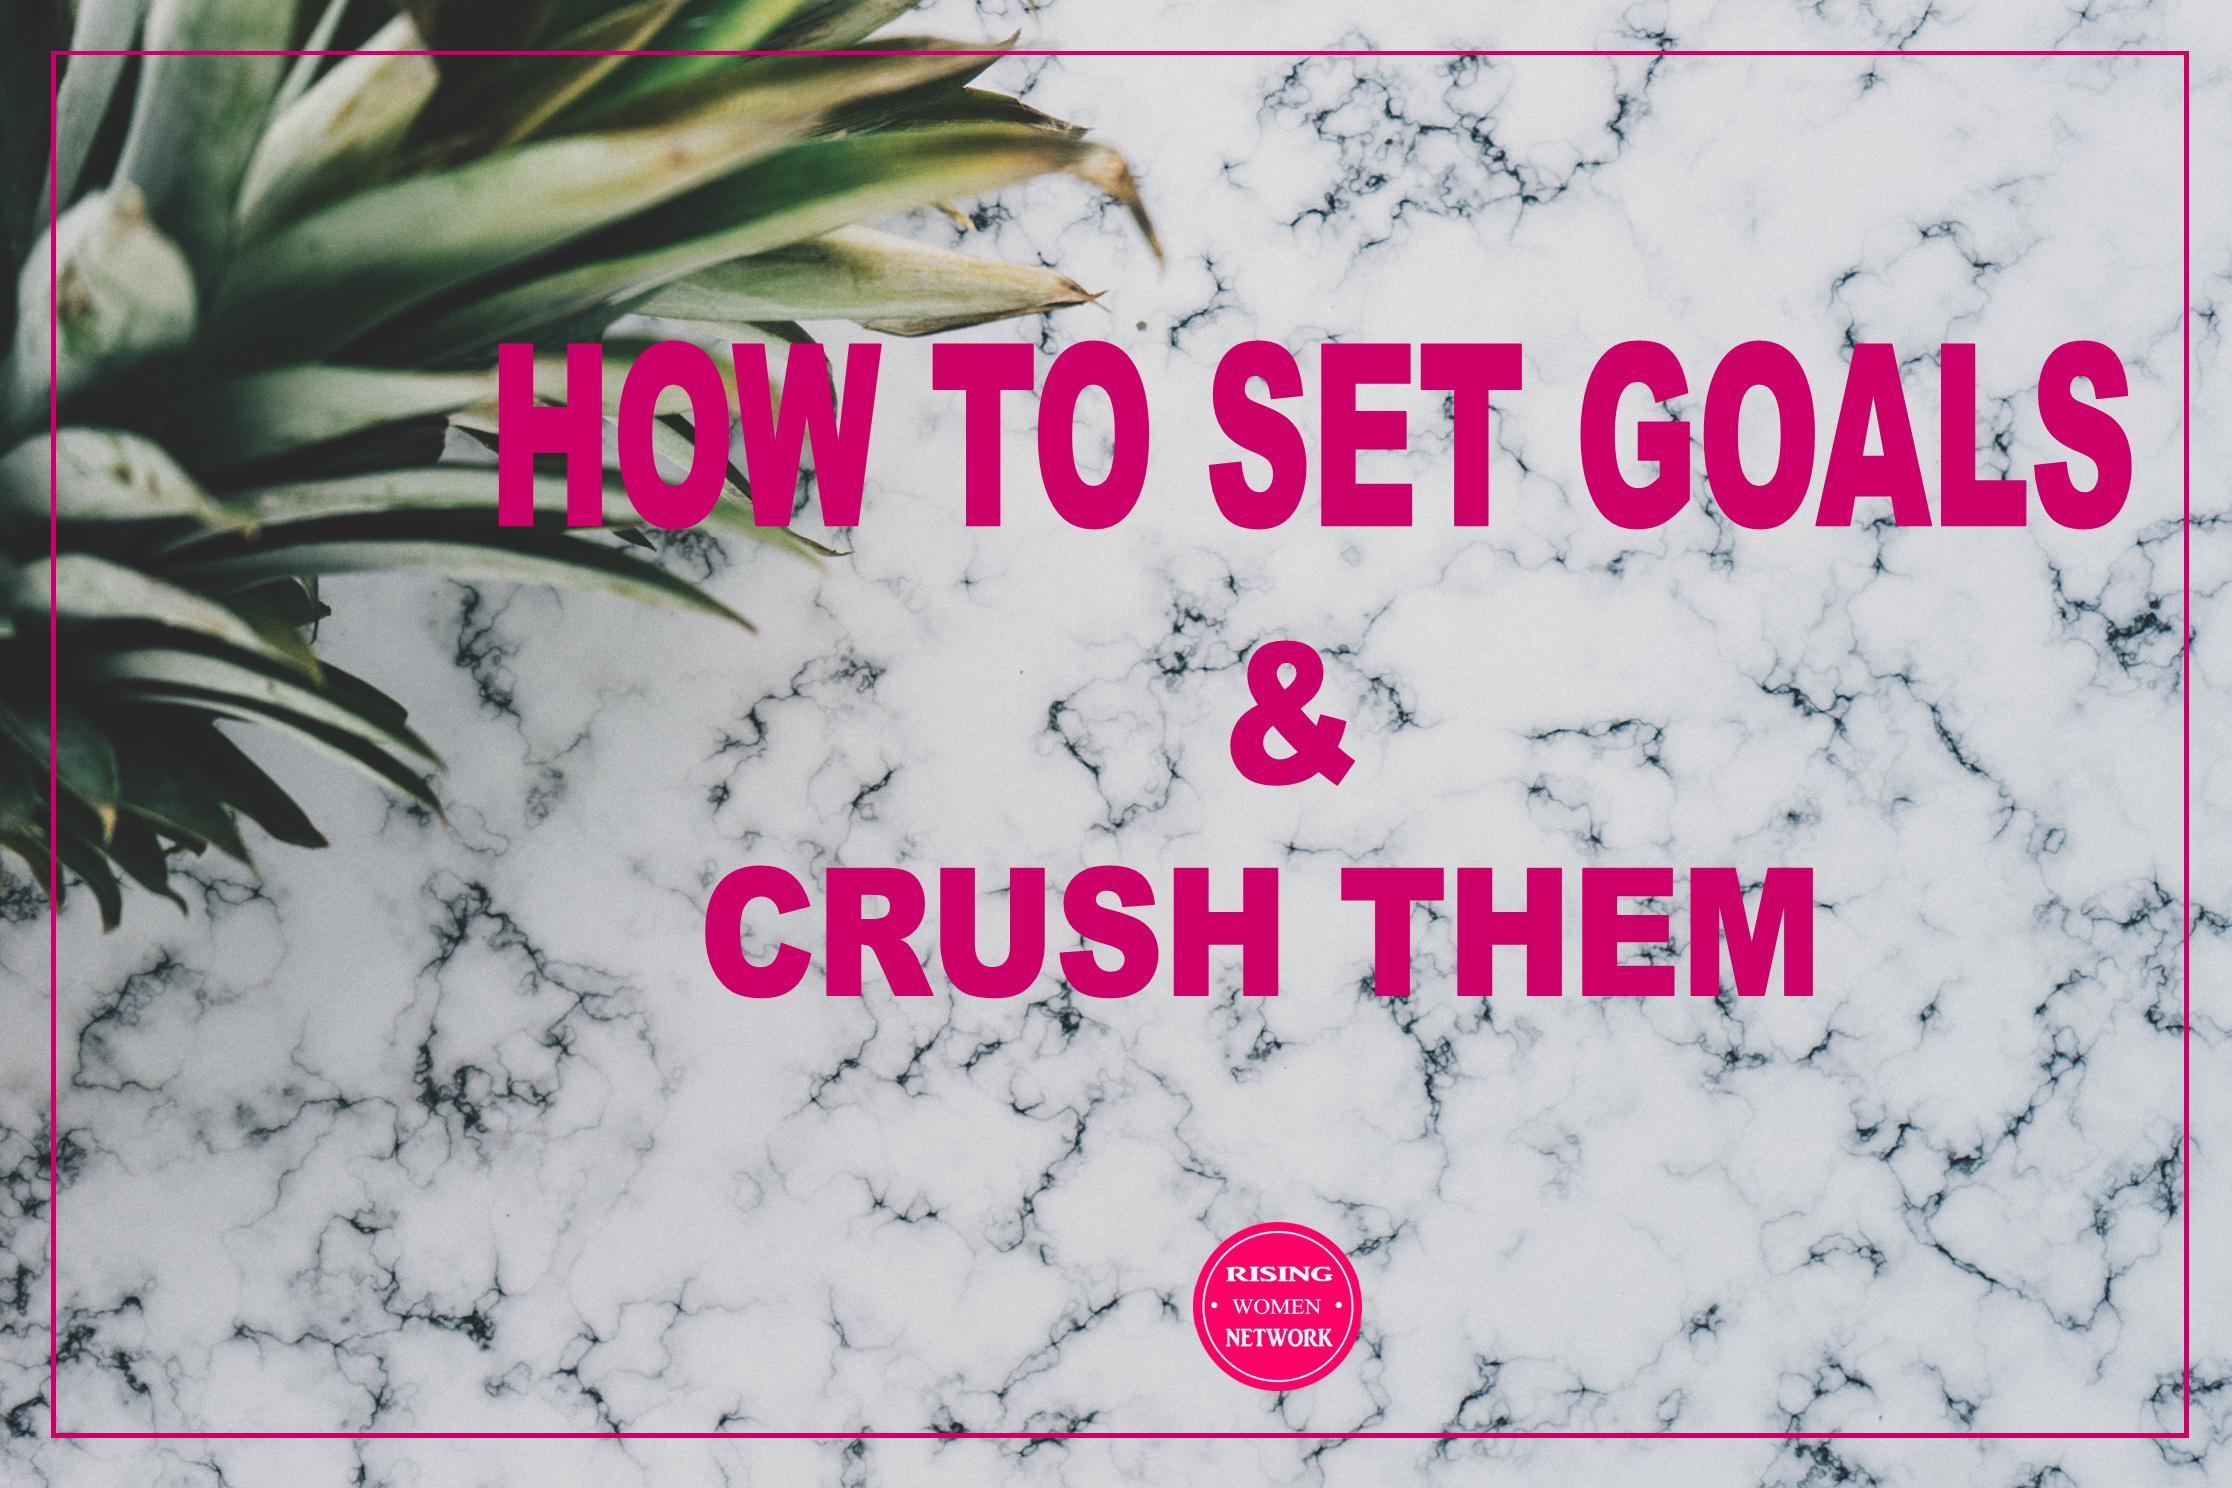 HOW TO SET GOALS & CRUSH THEM